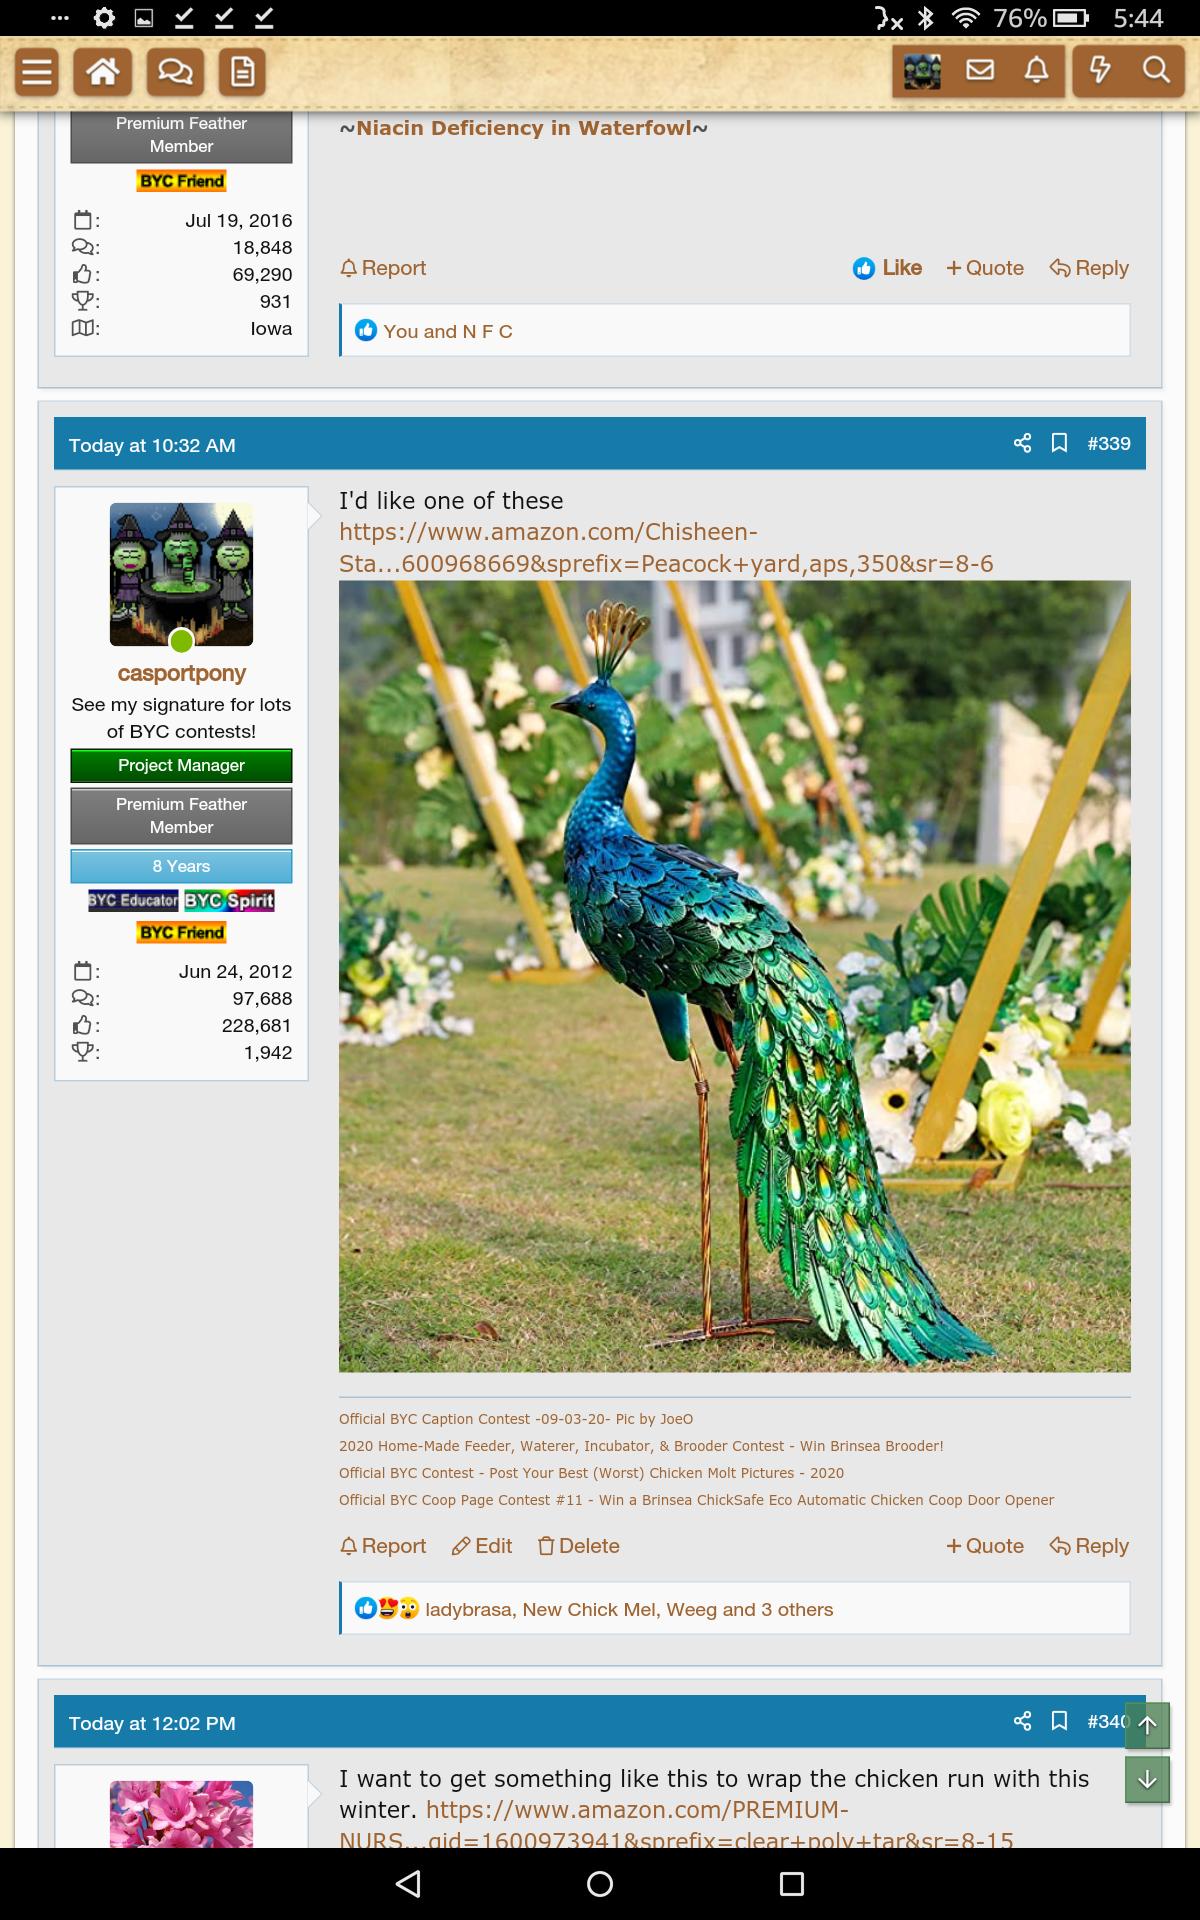 Screenshot_2020-09-24-17-44-11.png